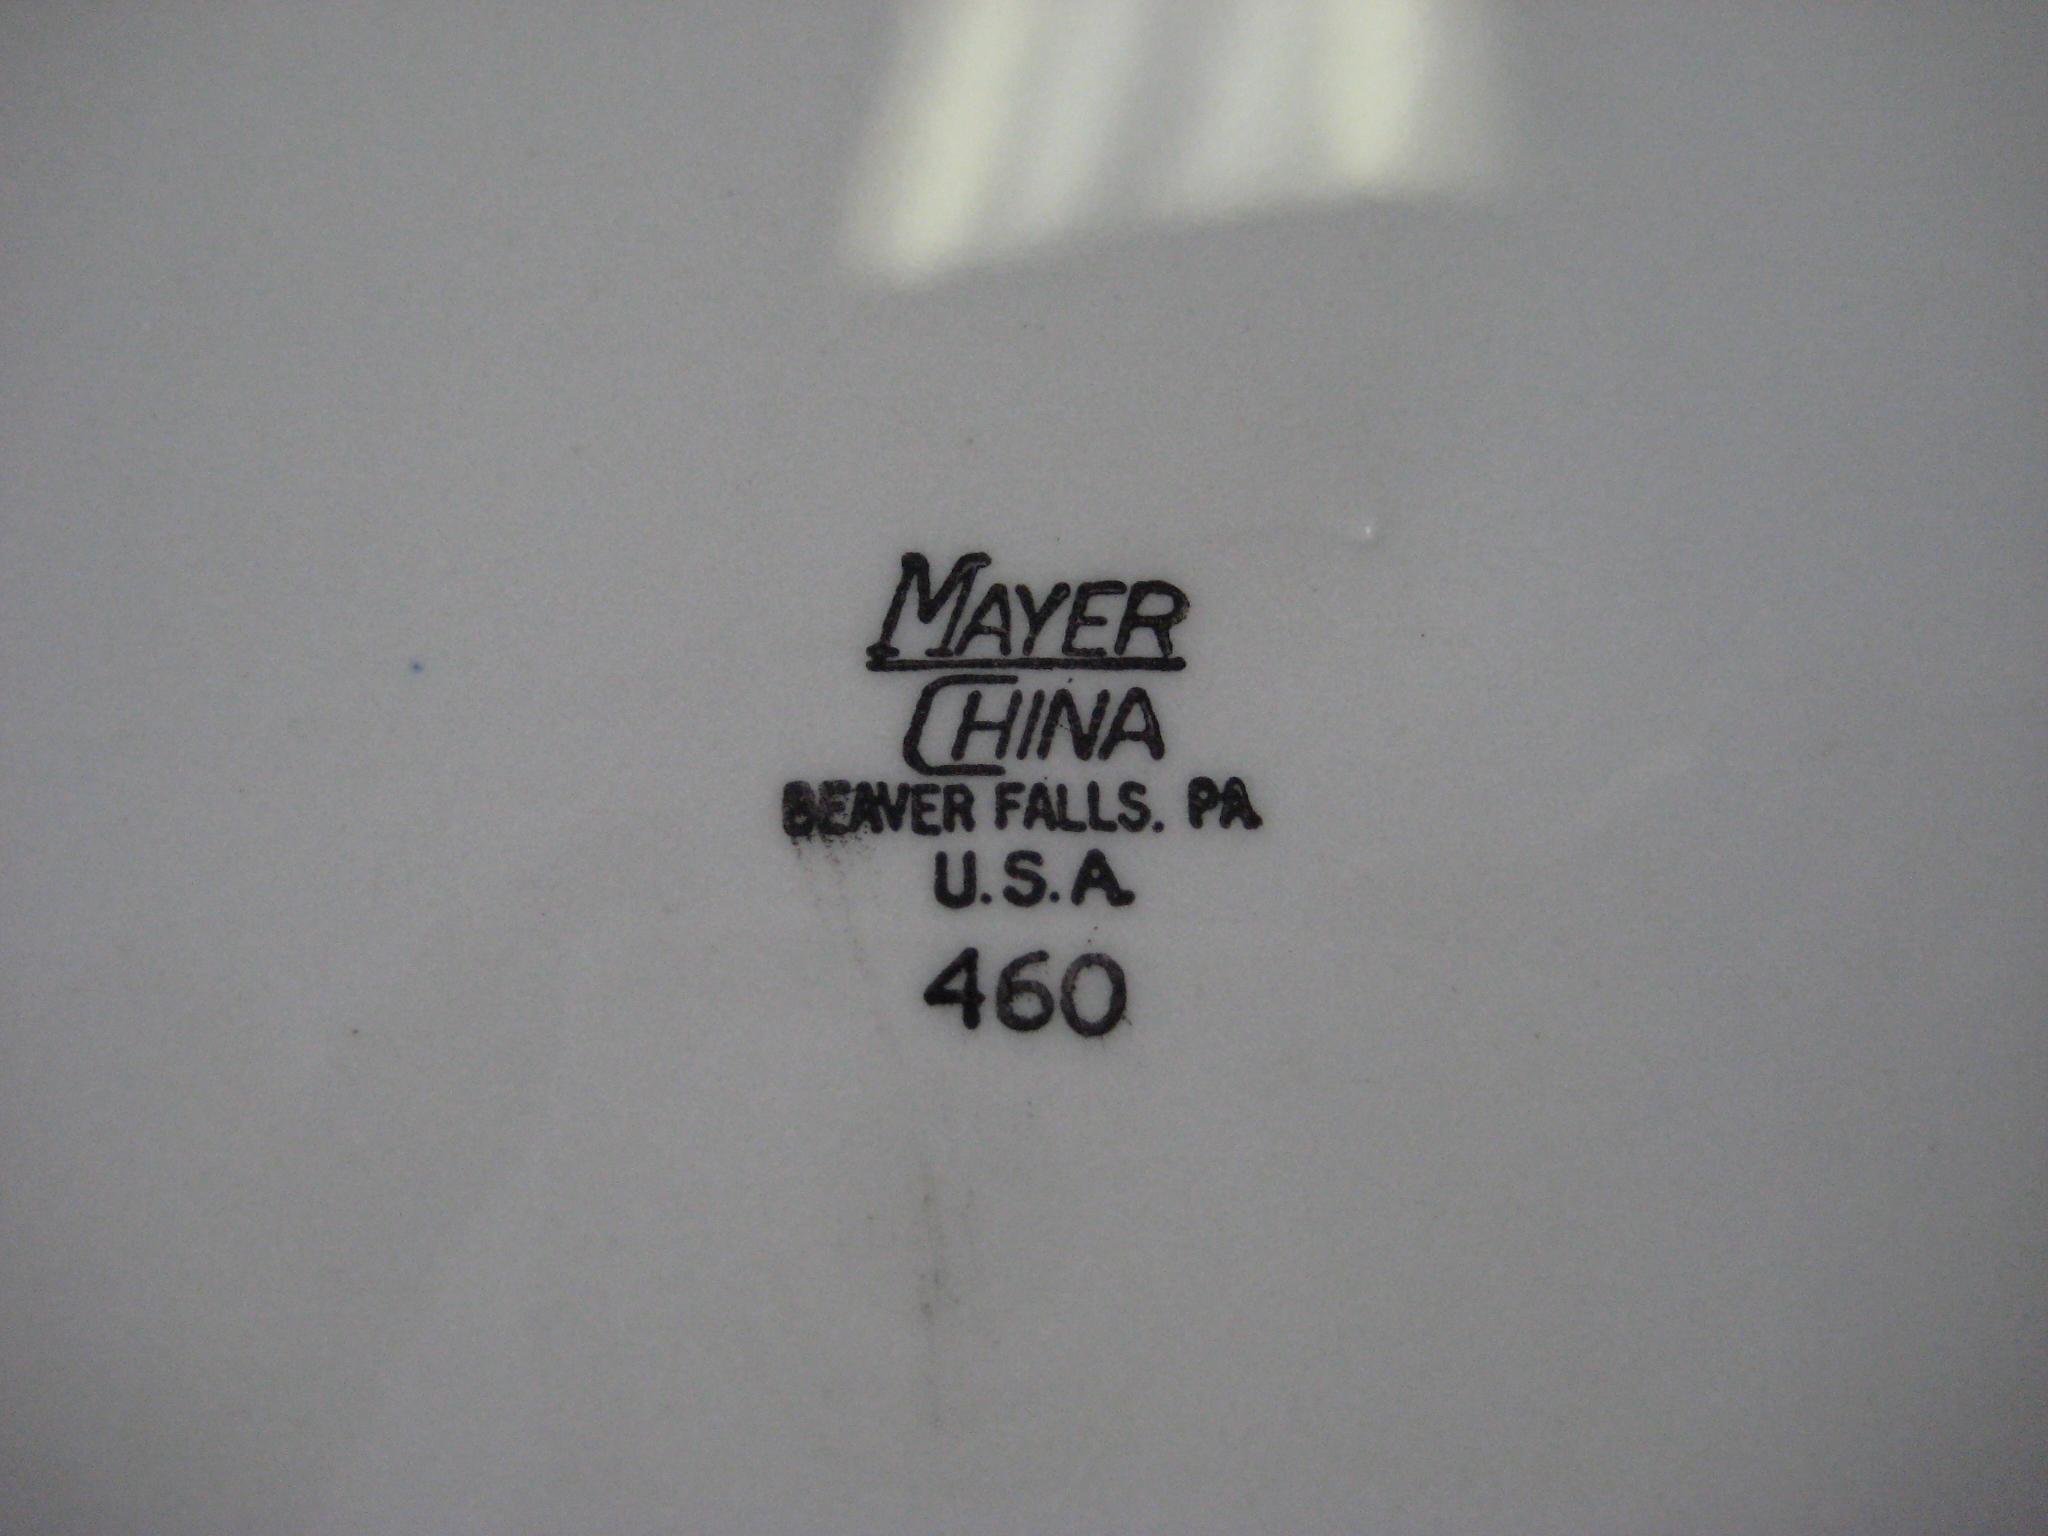 Playboy club Mayer China 460 Plate